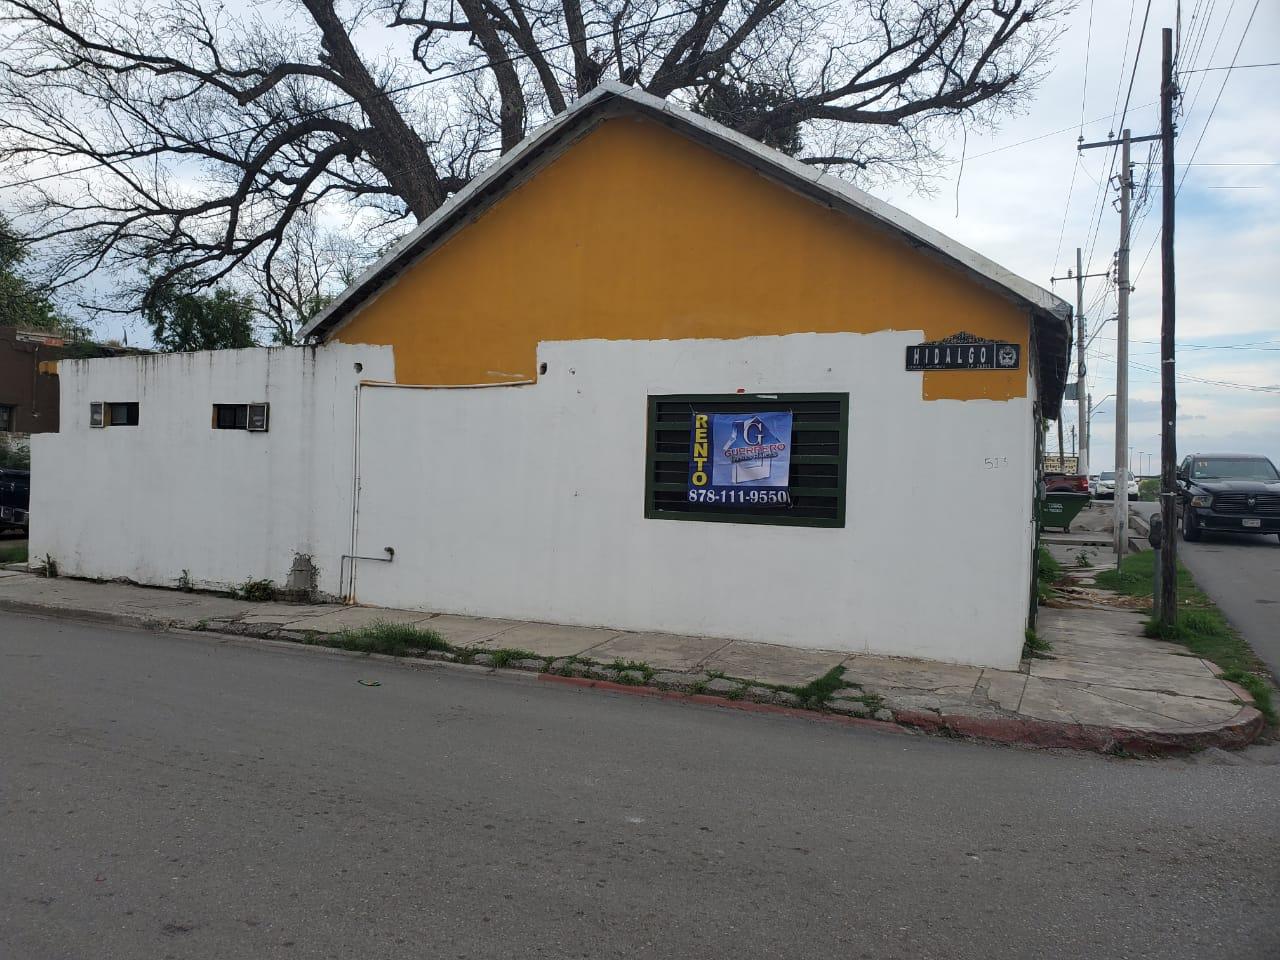 Rento Local Comercial $8,000 Calle Fuente esq Hidalgo zona Centro, Piedras Negras Coahuila.(RL #27)